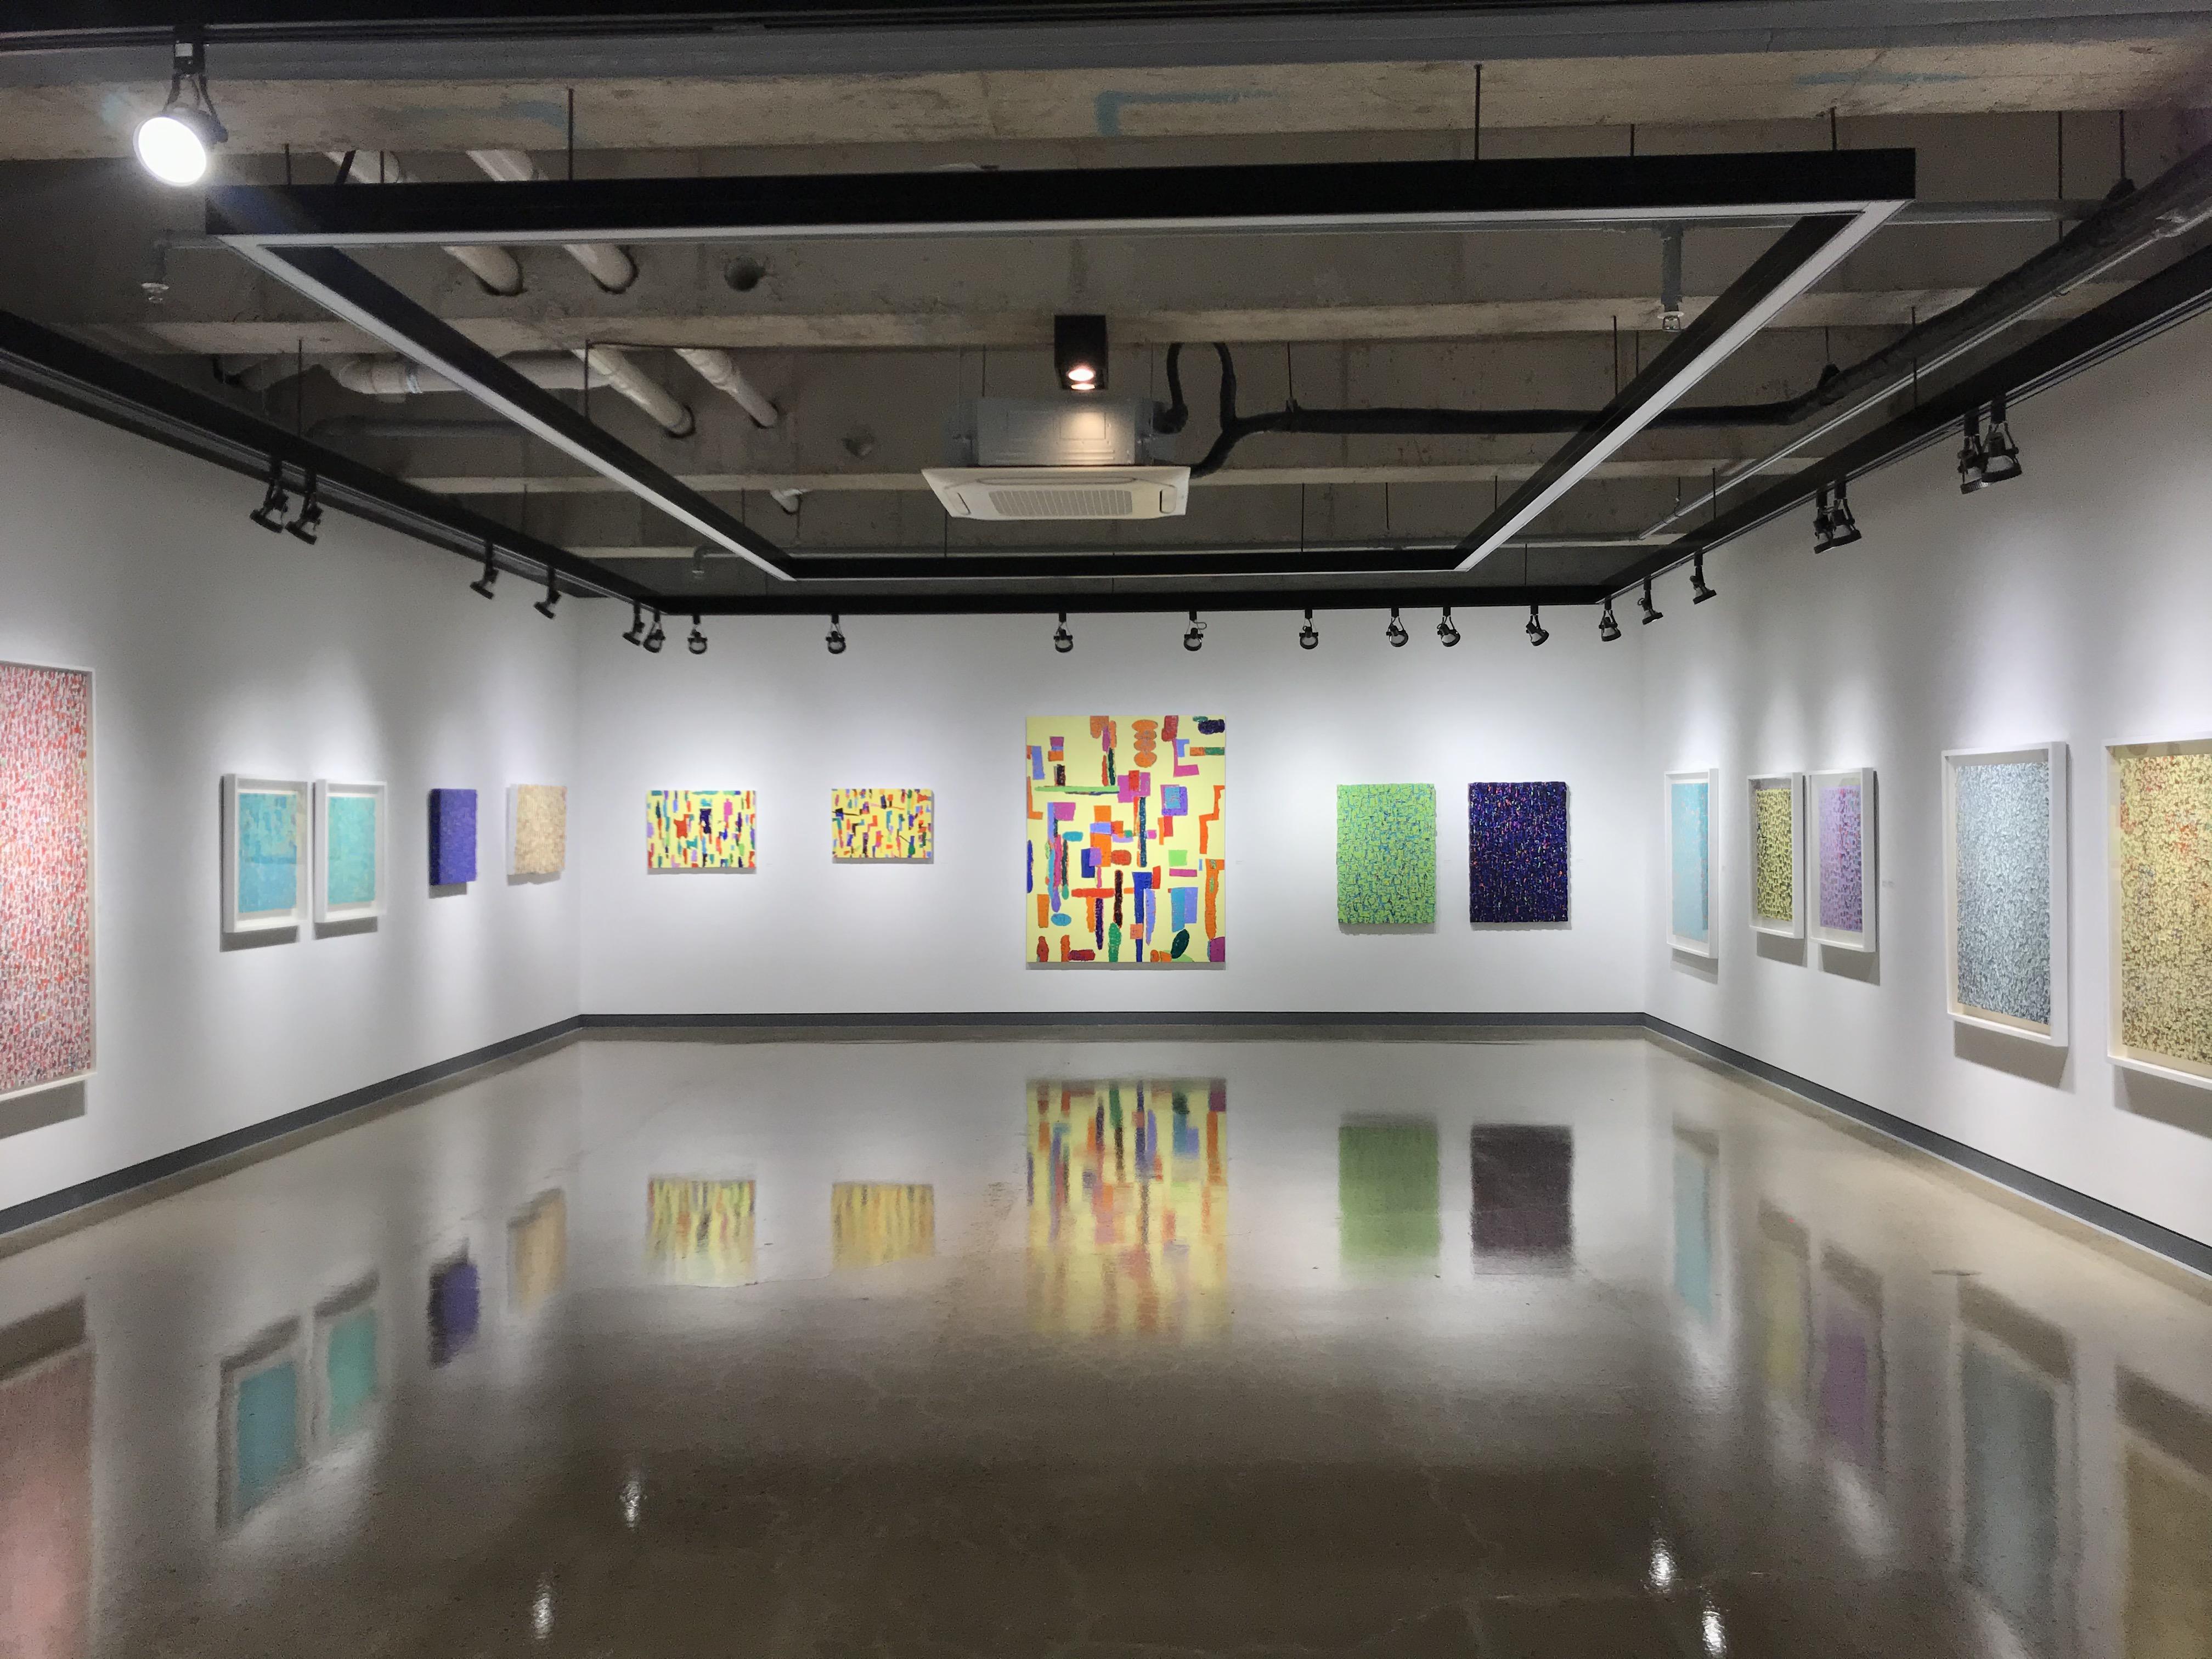 http://deyoungmuseum.co.kr/bs/se2/imgup/1591336543KakaoTalk_20200605_110036196.jpg